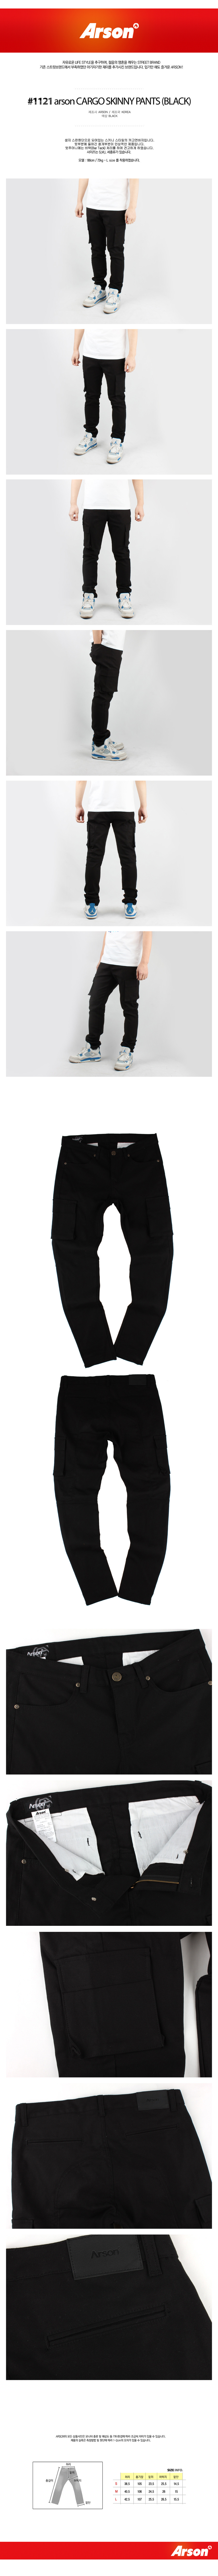 [ ARSON ] [Arson] ARSON GENUINE/ARSON 1121 CARGO PANTS (BLACK)/pants/longpants/cargopants/cottonpants